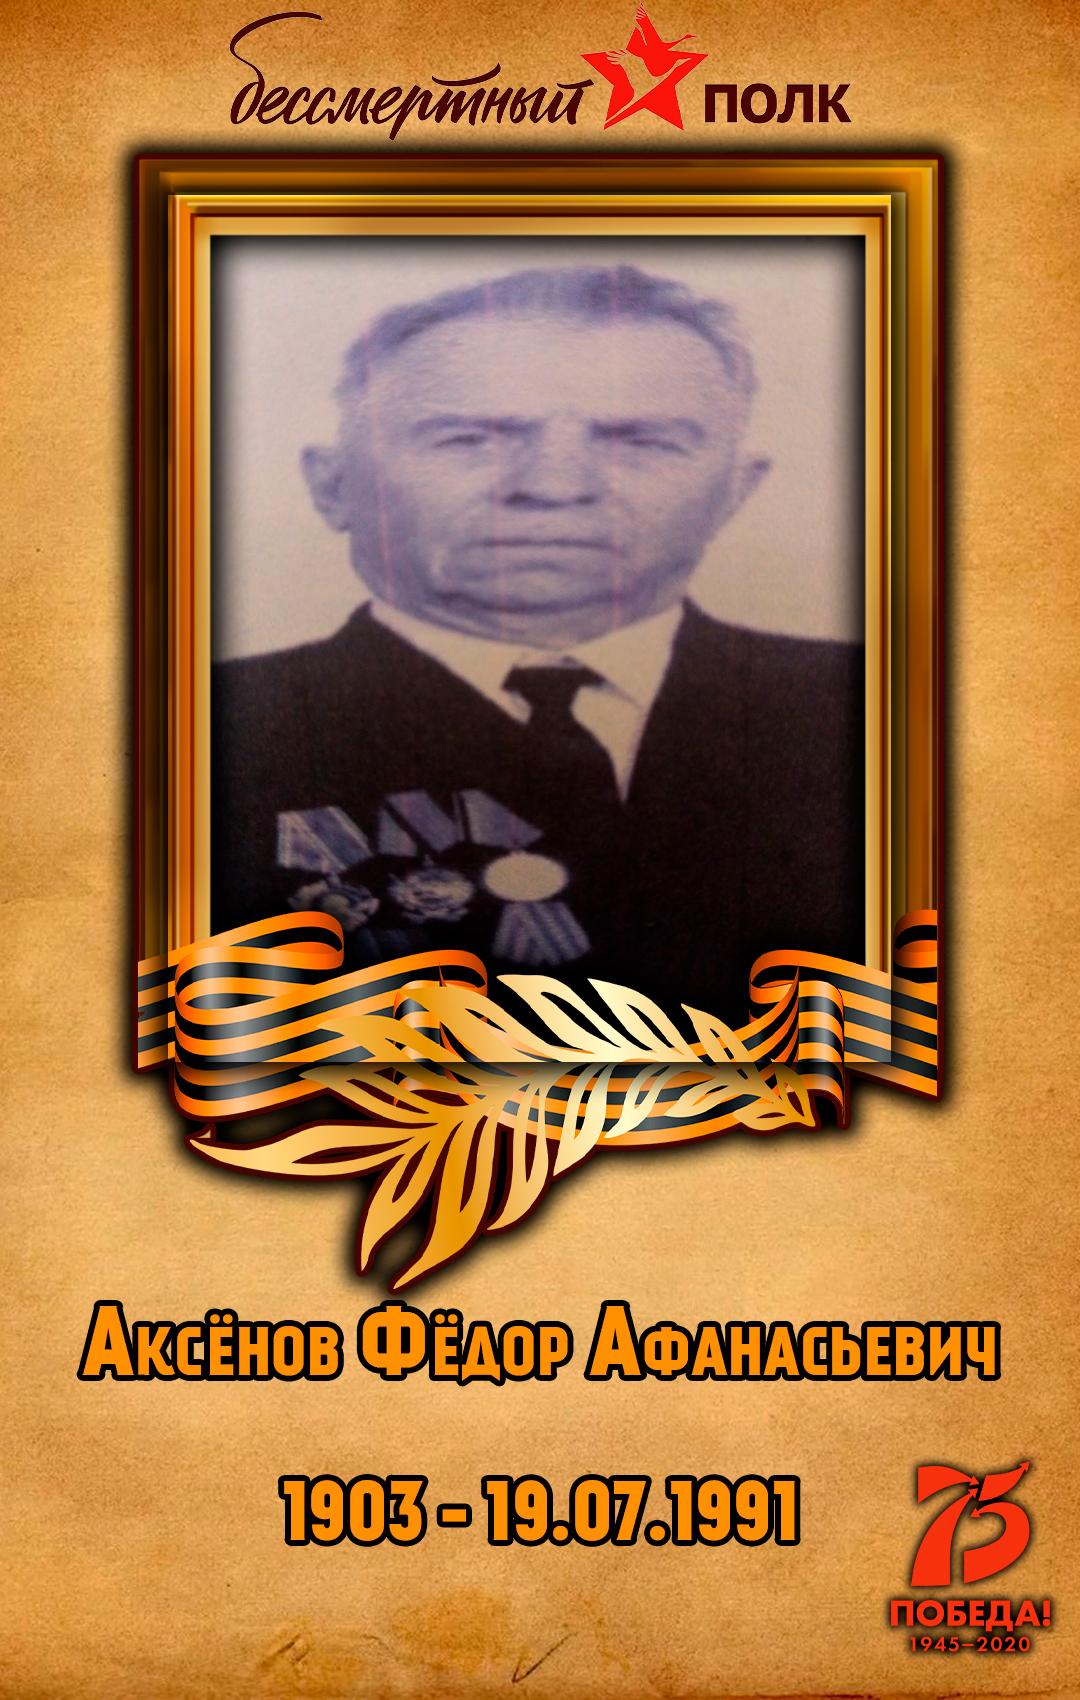 Аксёнов-Фёдор-Афанасьевич